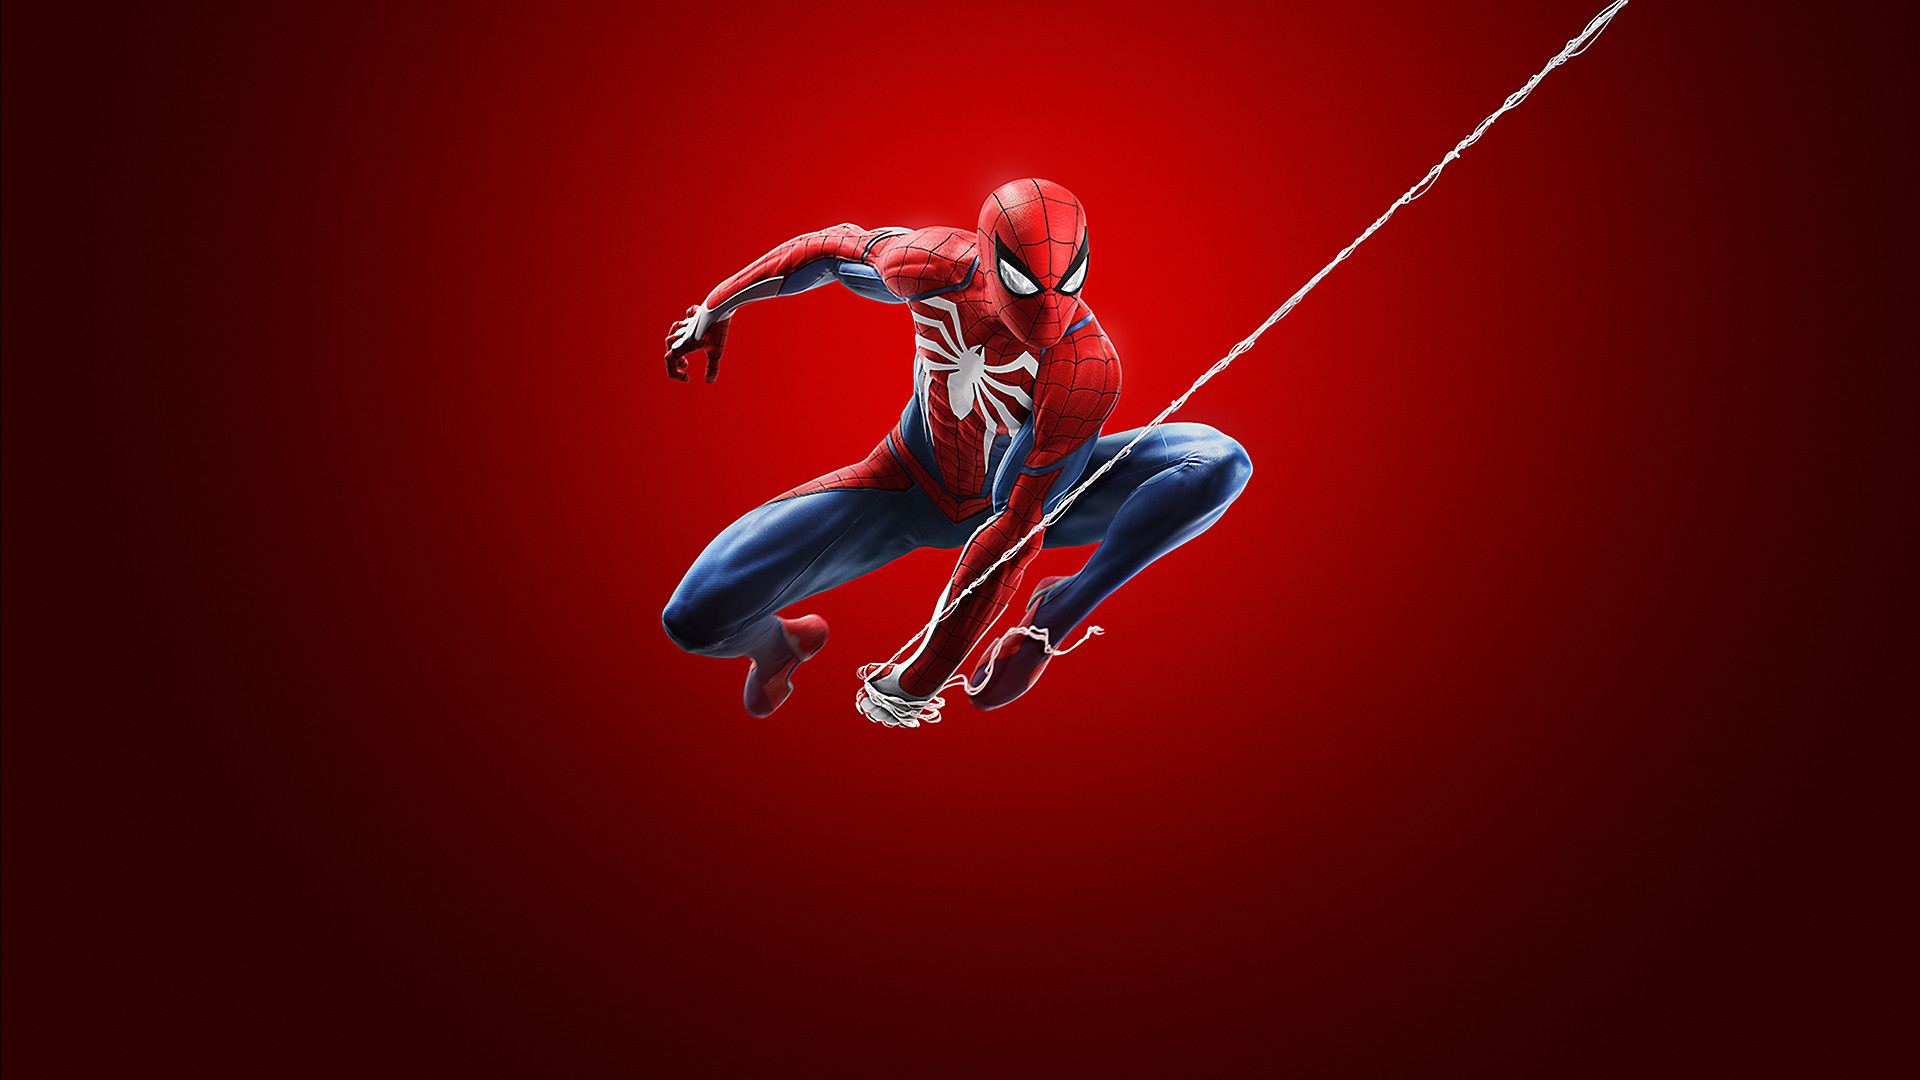 Spider-Man PS4 Walkthrough Part 6 - Fisk Hideout (Main Mission)